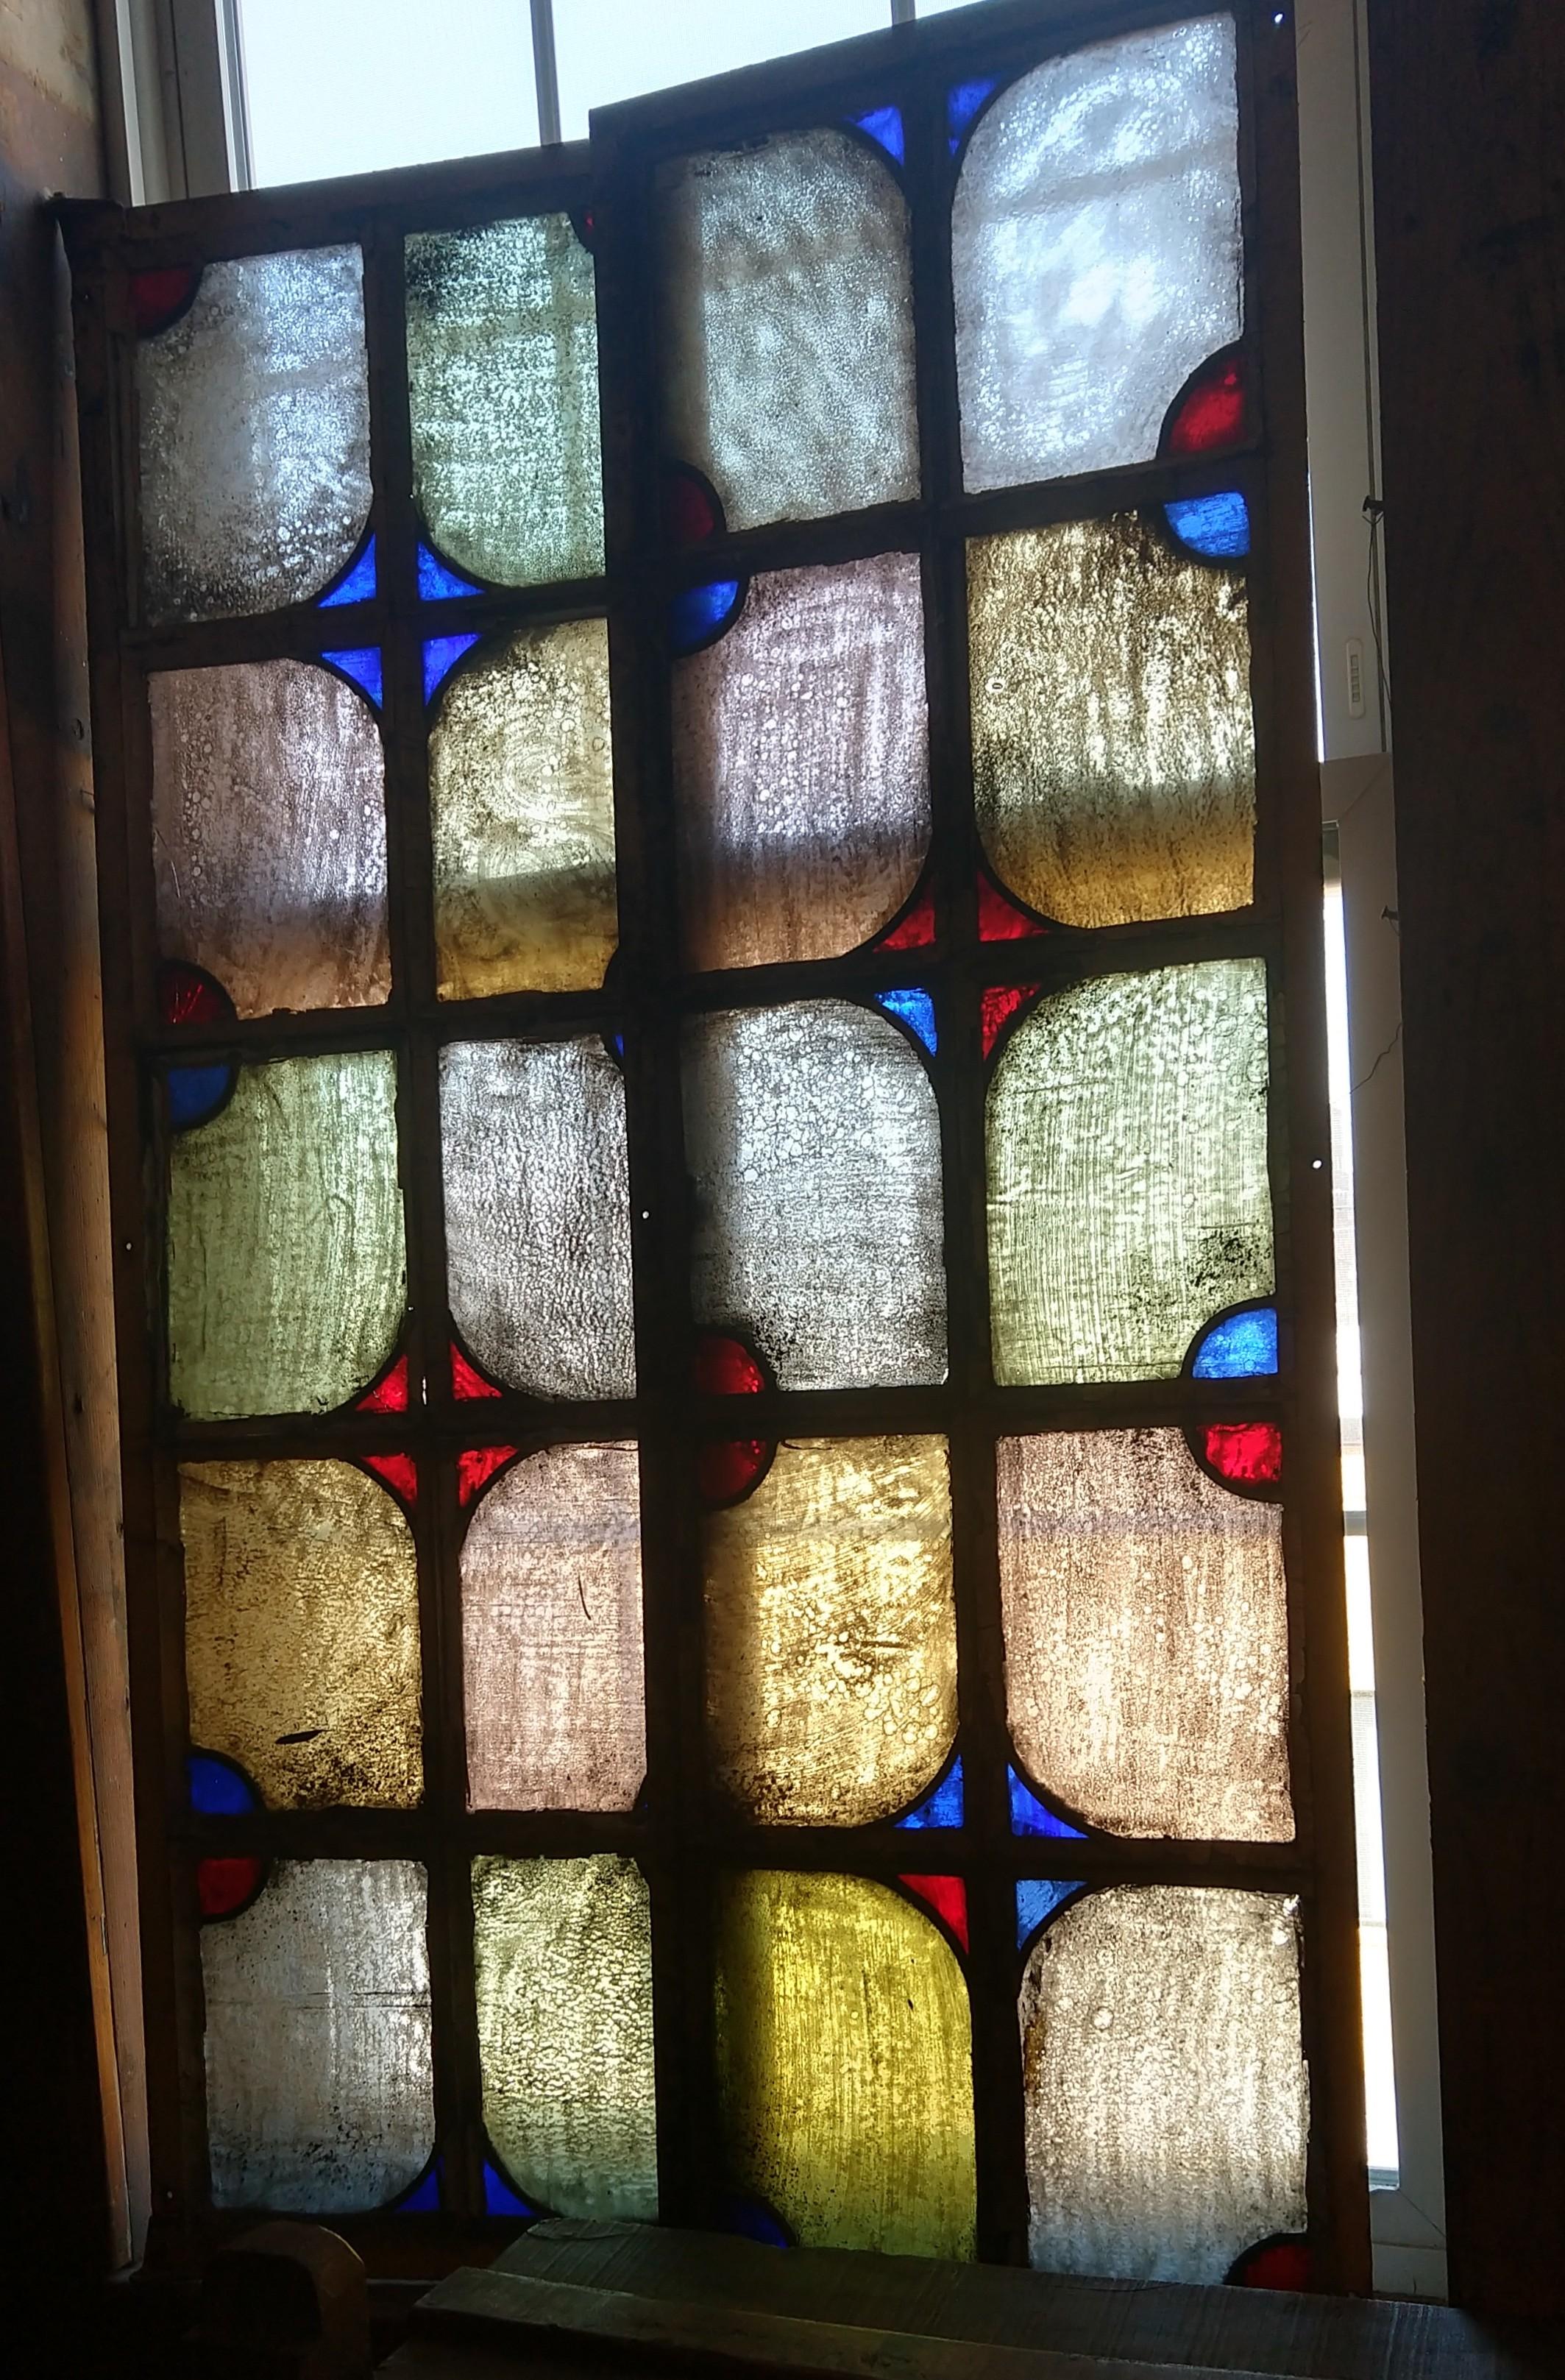 Steel Casement Church windows